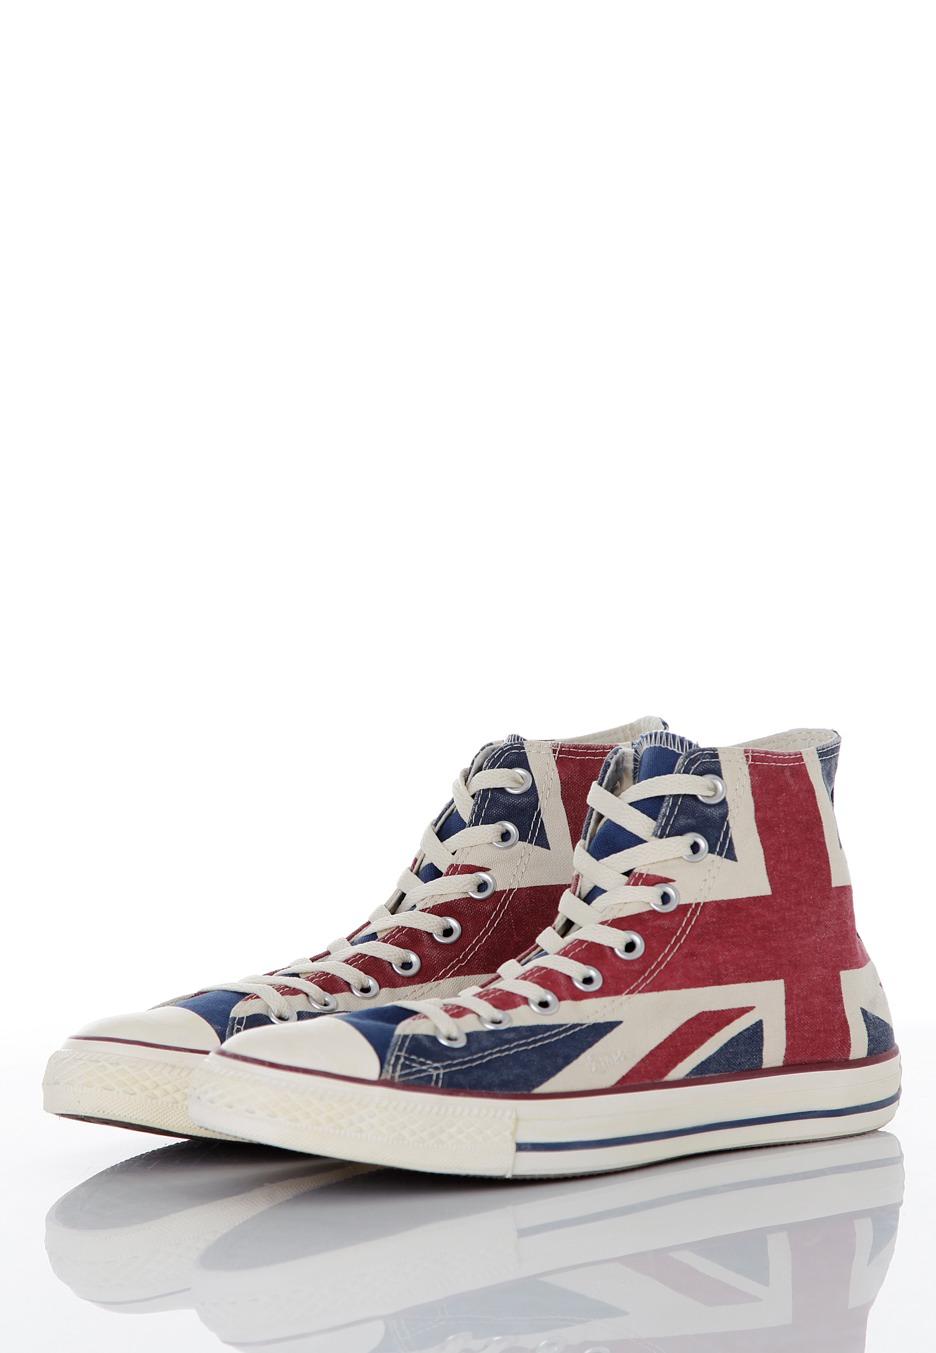 065d8f7fbafc ... Converse - CT All Star Union Jack Hi UK Flag Distressed - Shoes ...